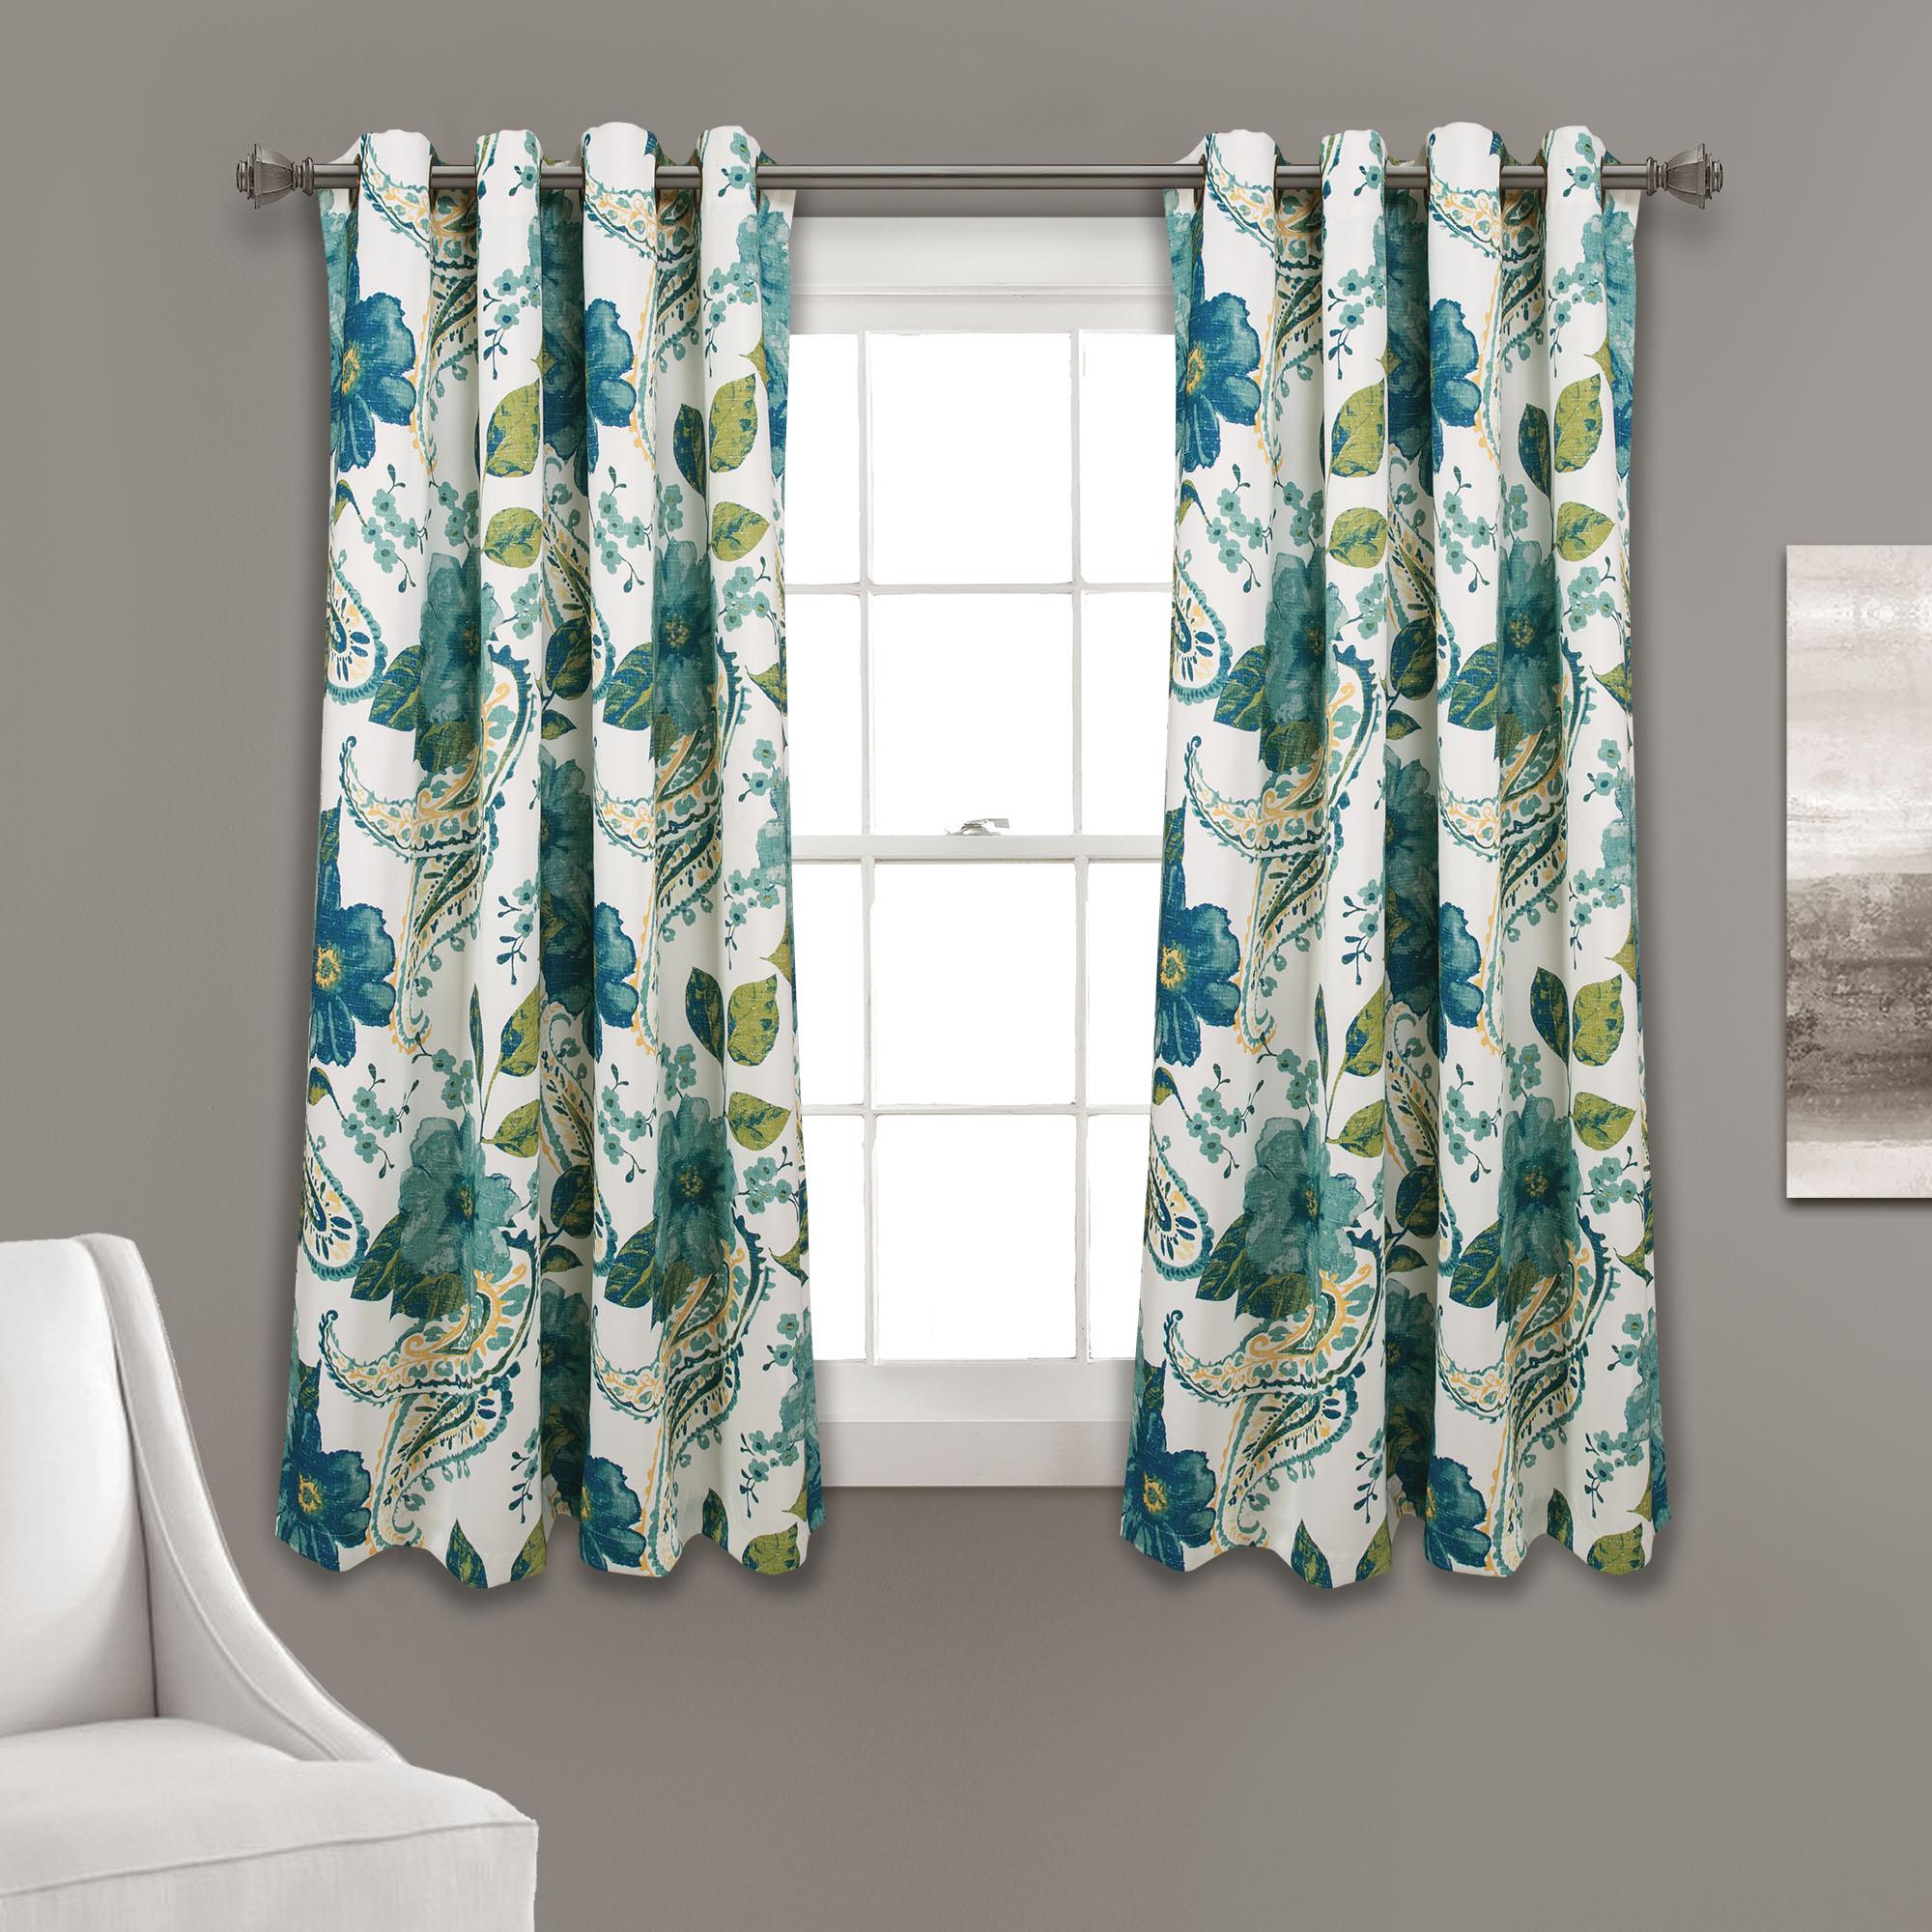 Floral Paisley Room Darkening Window Curtain Panels Blue